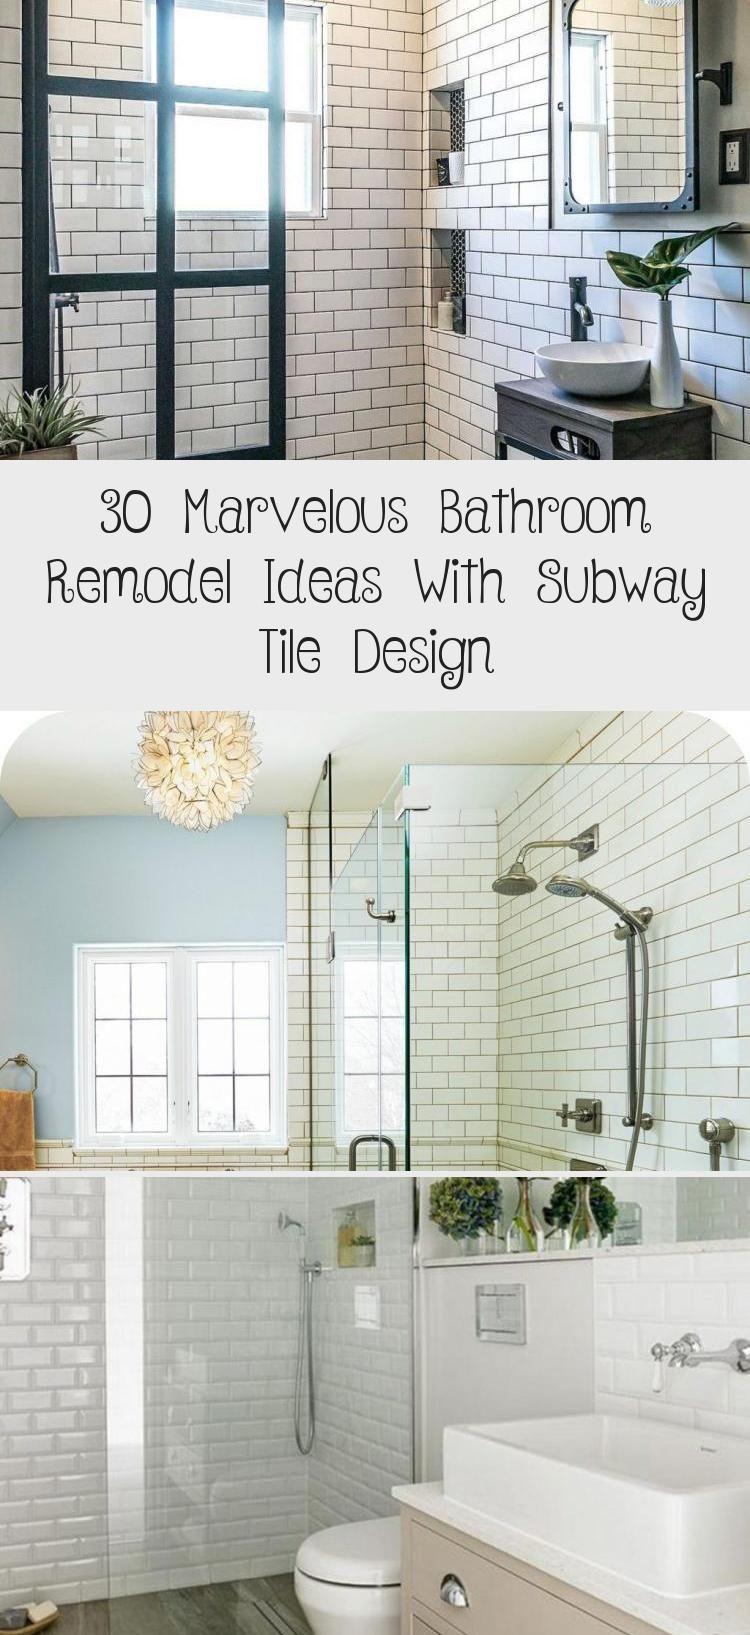 30 Marvelous Bathroom Remodel Ideas With Subway Tile Design White Bathroom Tiles Bathroom Tile Designs Simple Bathroom